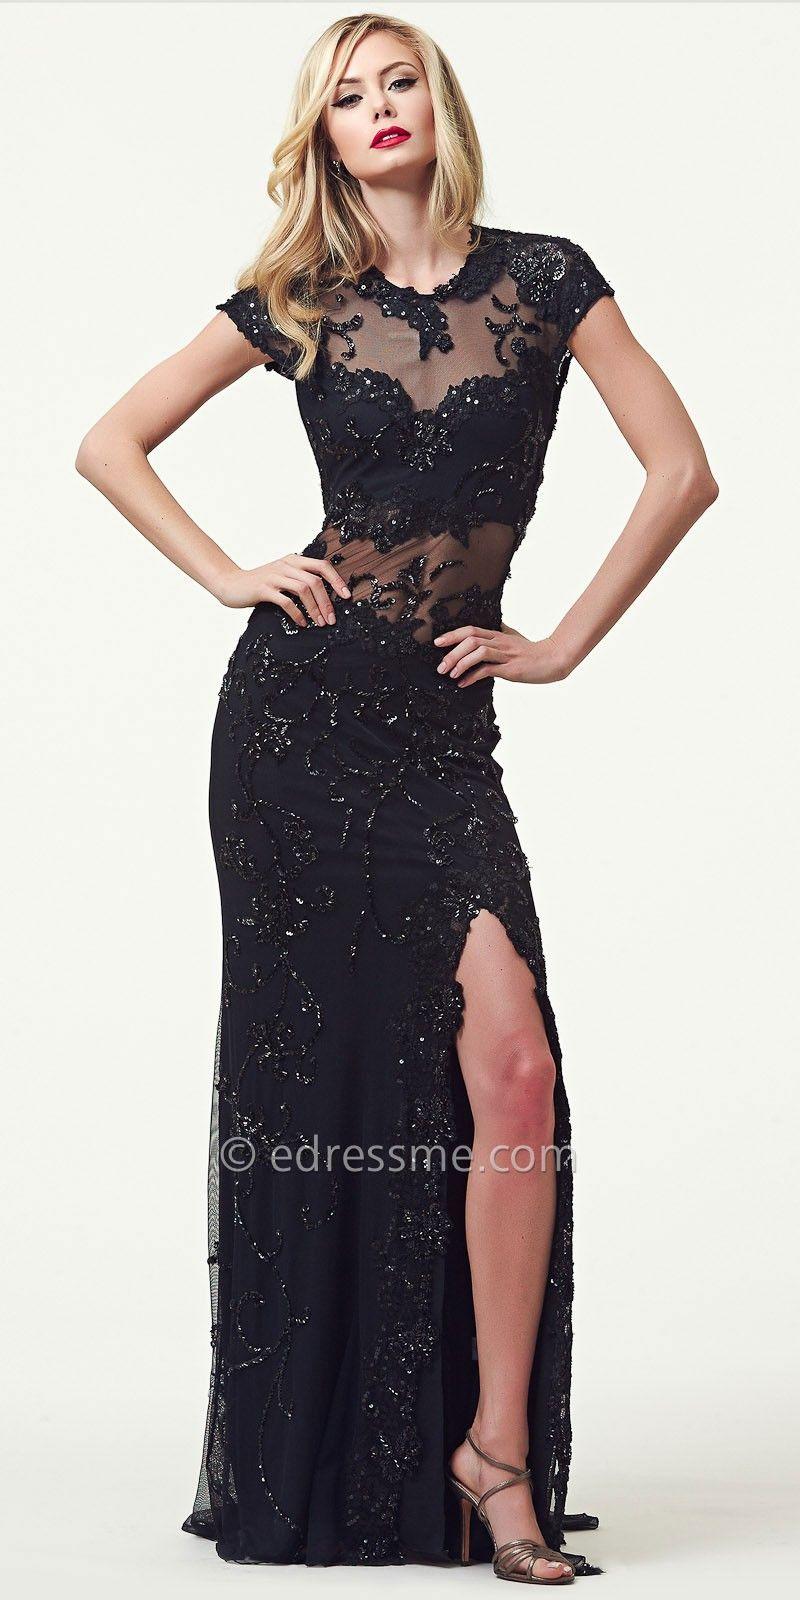 Black formal dress by mac duggal edressme pintowin fashion